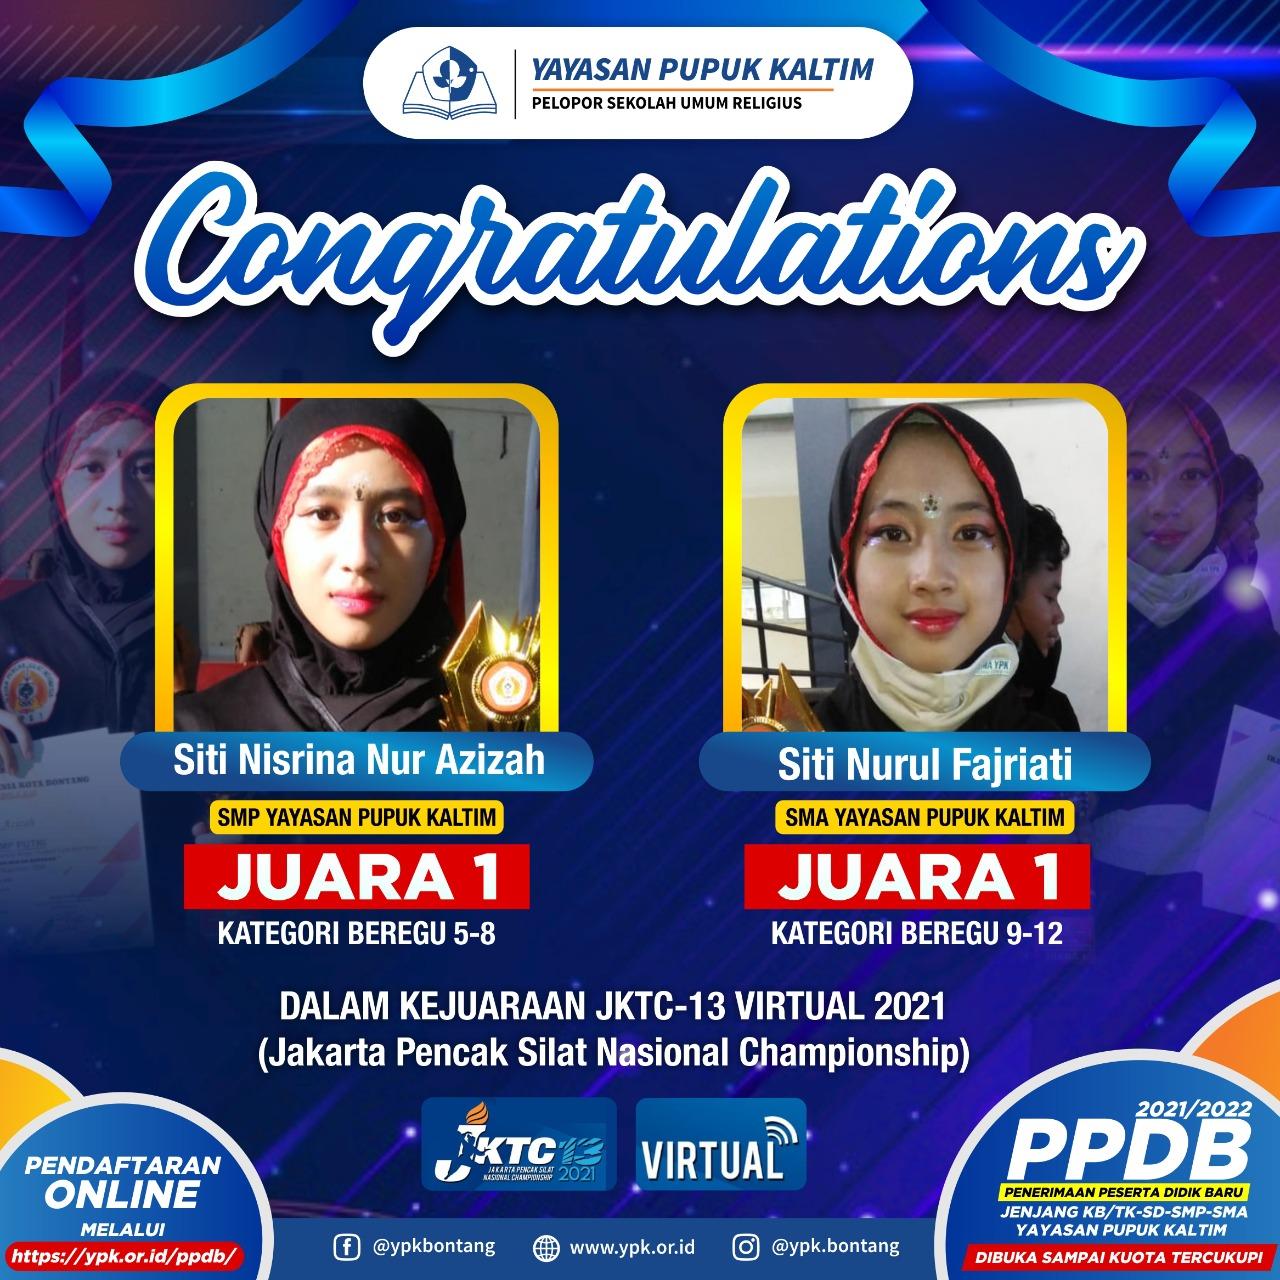 SMP YPK RAIH JUARA PENCAK SILAT Jakarta Pencak Silat Nasional Championship (JKTC-13).